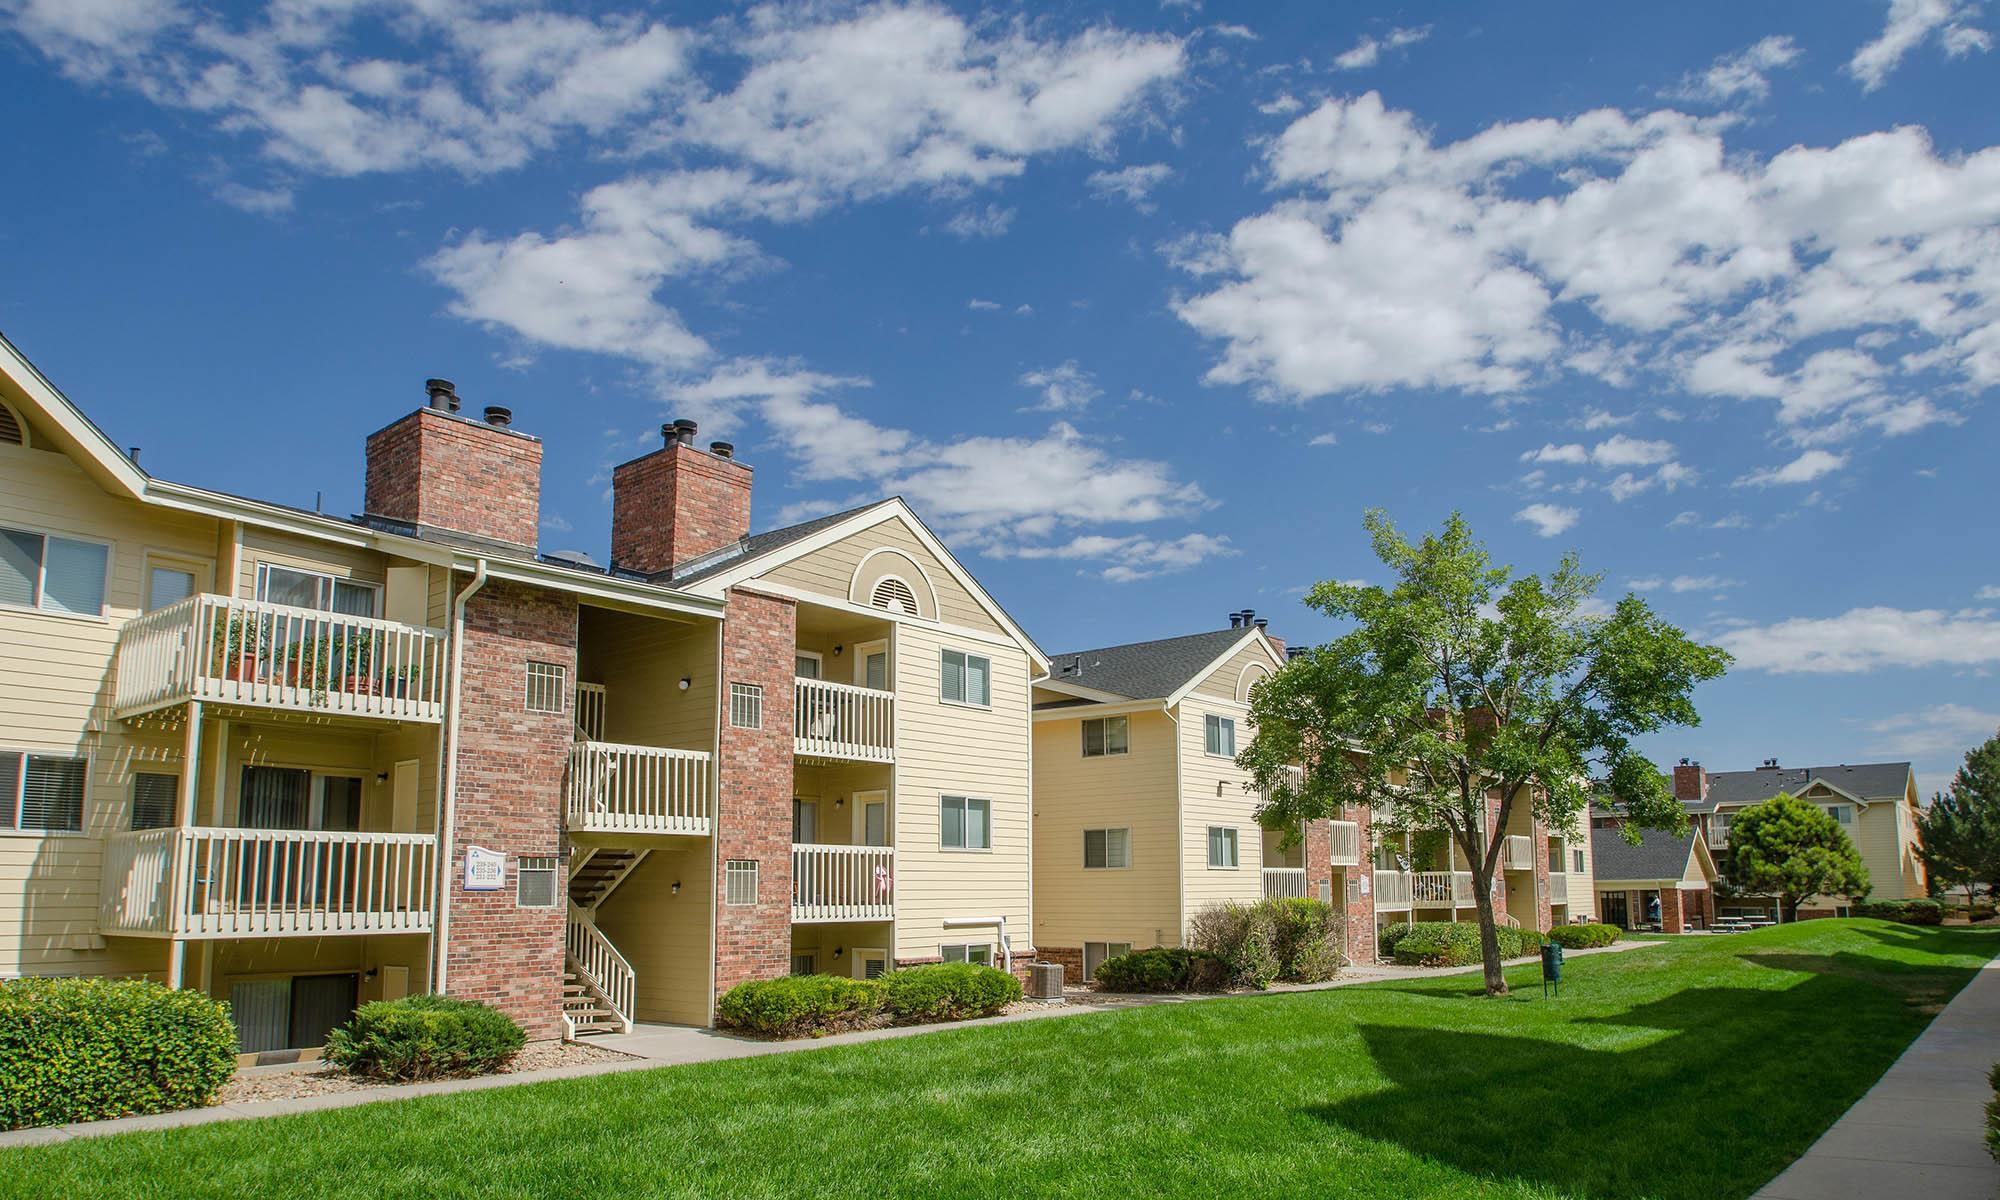 Apartments in Longmont, CO